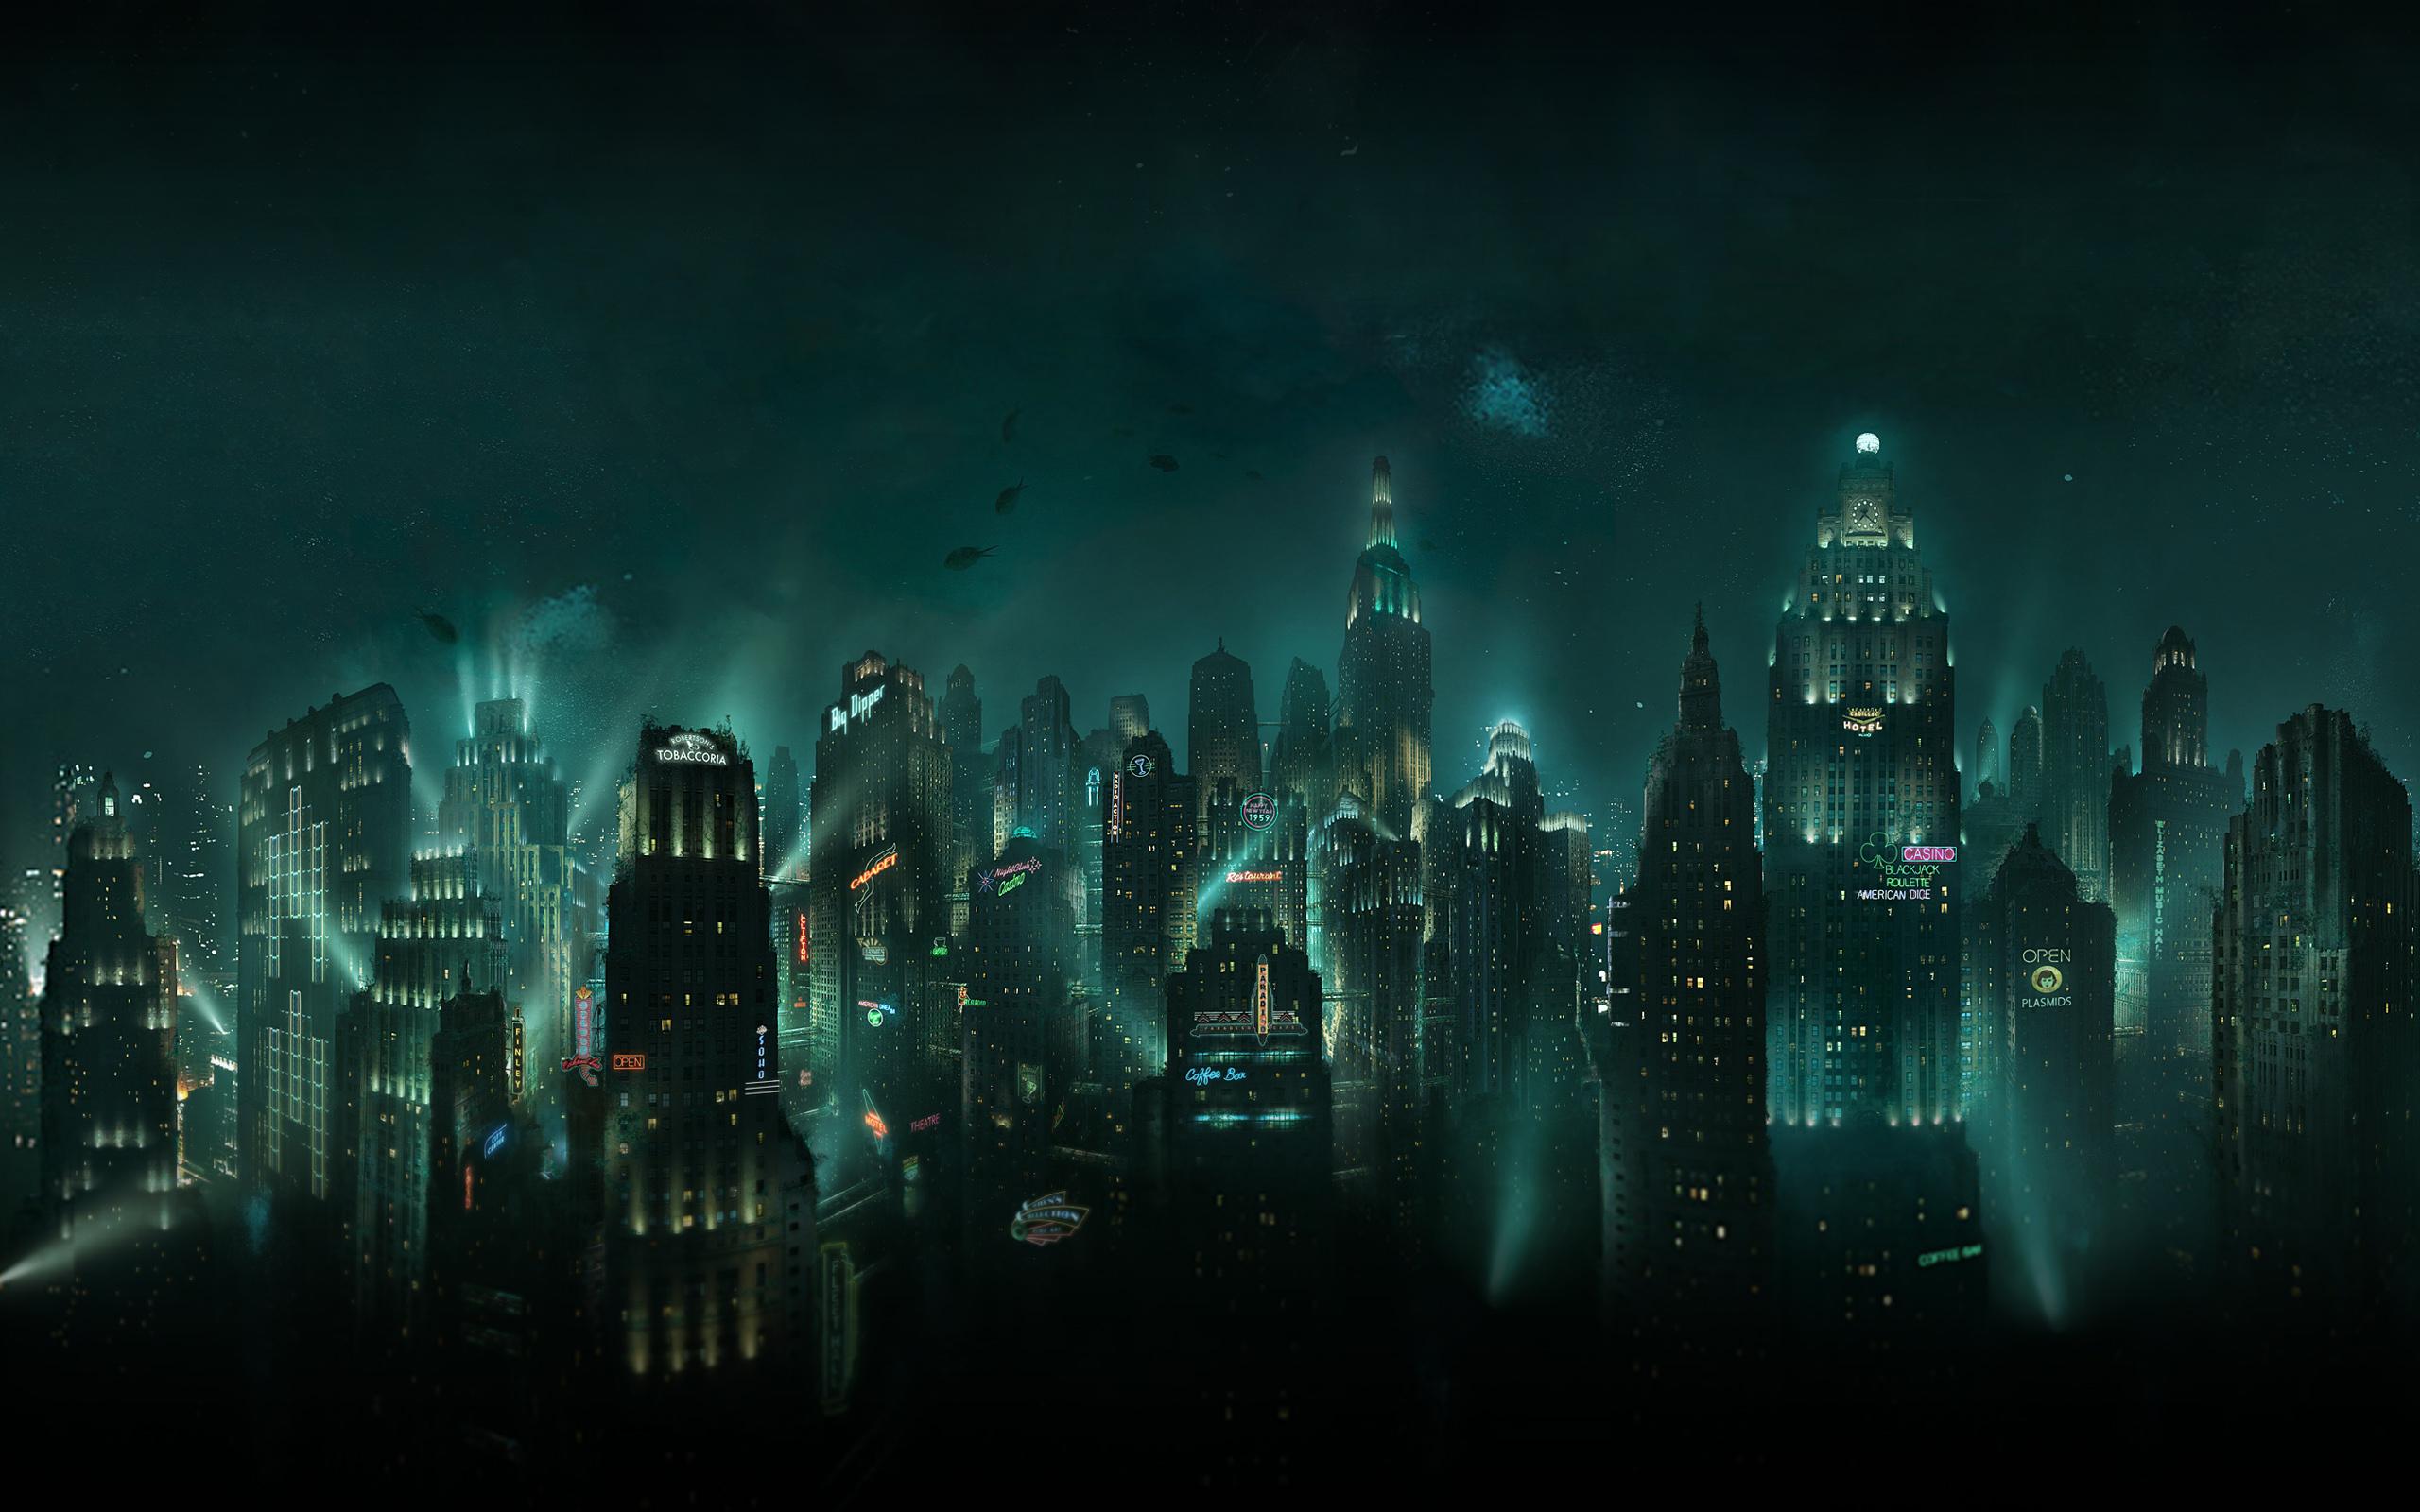 Bing Free Fall Wallpaper 240 Free Dystopian Music Playlists 8tracks Radio